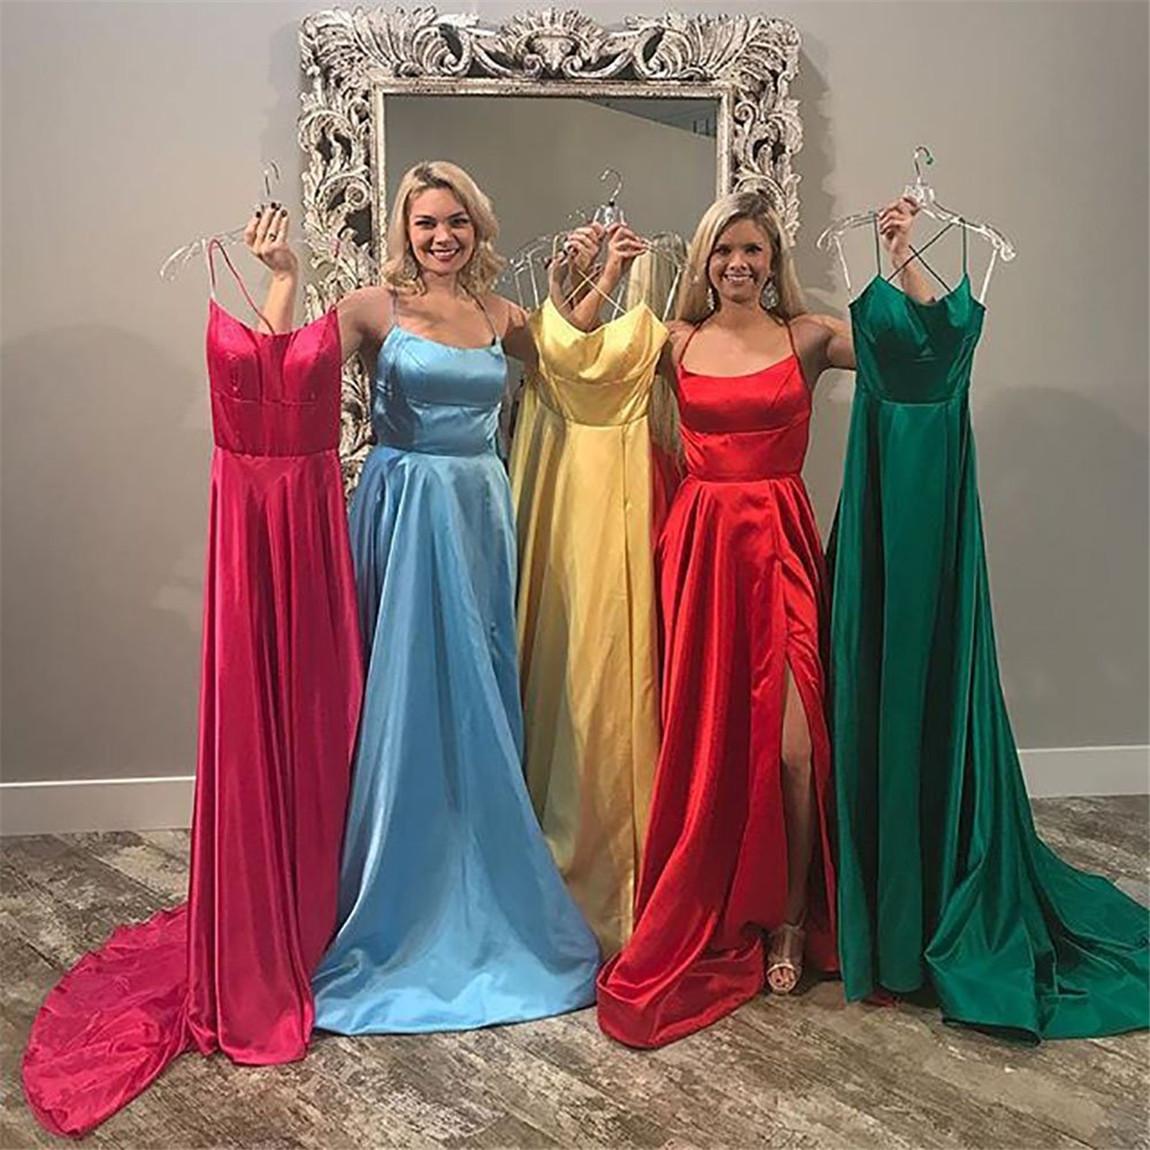 Halter Neck Prom Dresses 2020 Sexy Backless Front Split  A line Prom Party Dress vestidos de festa longo вечернее платье